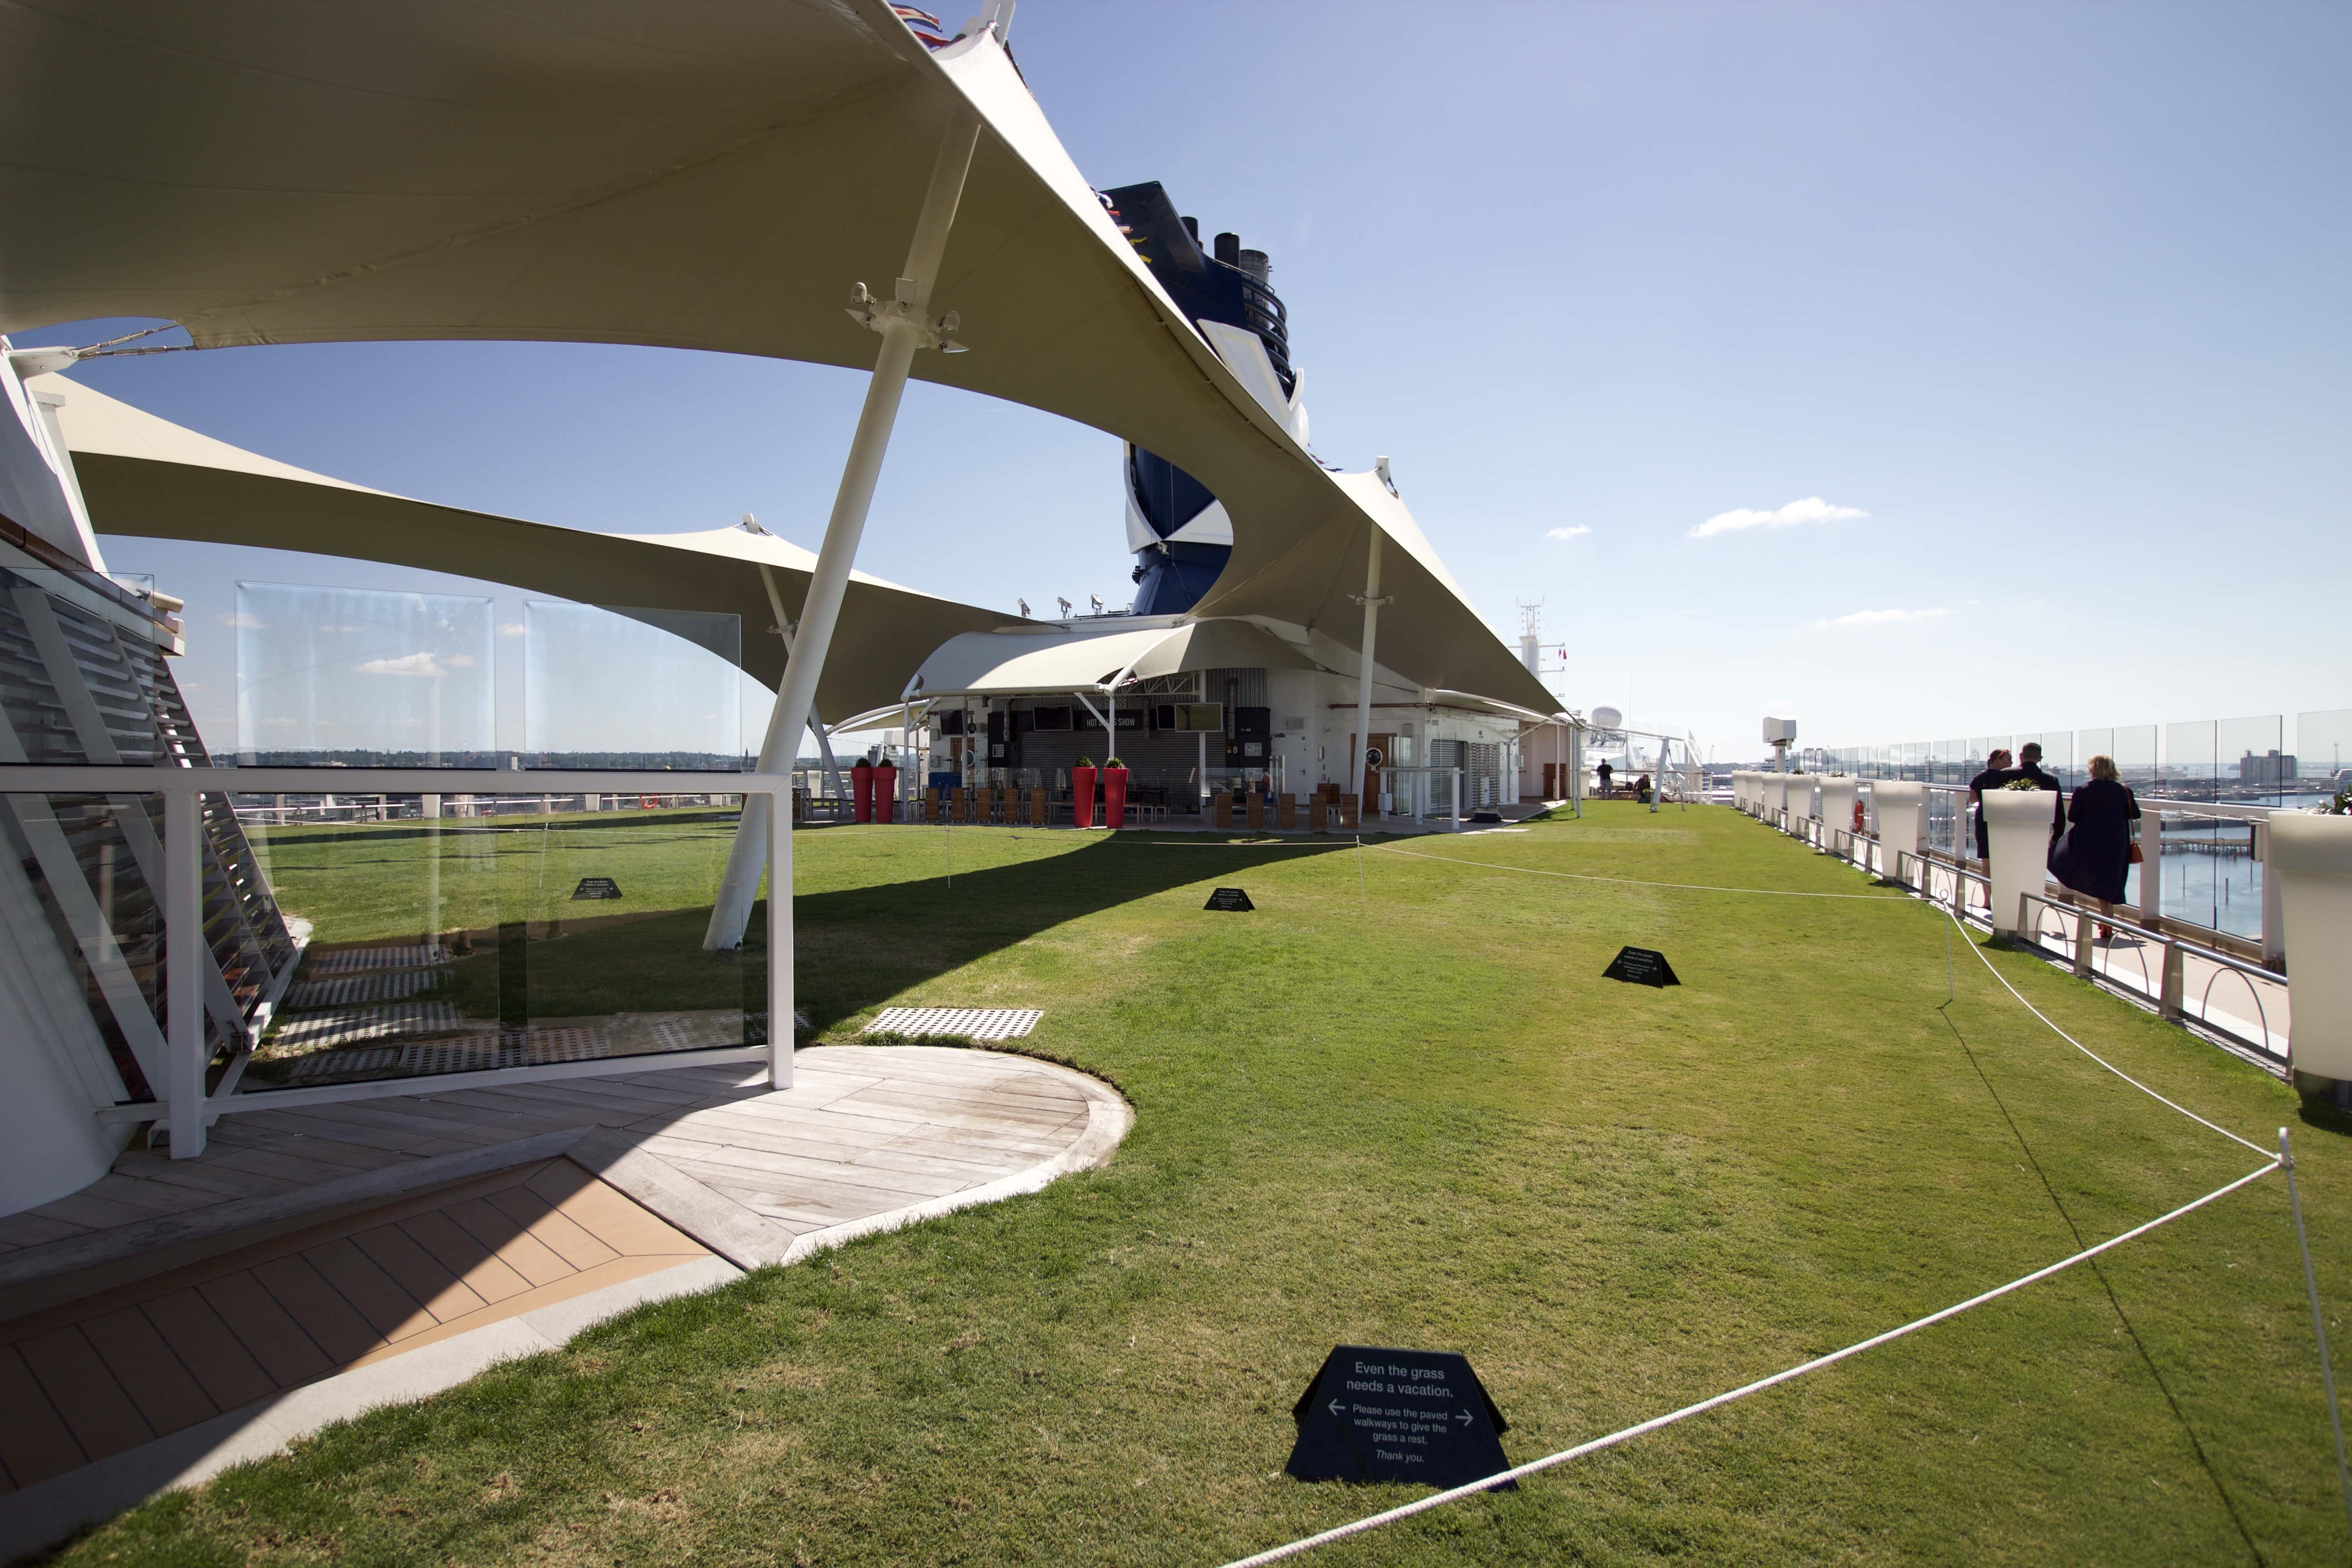 Celebrity Eclipse - Lawn club grass sunshine funnel cruise ship